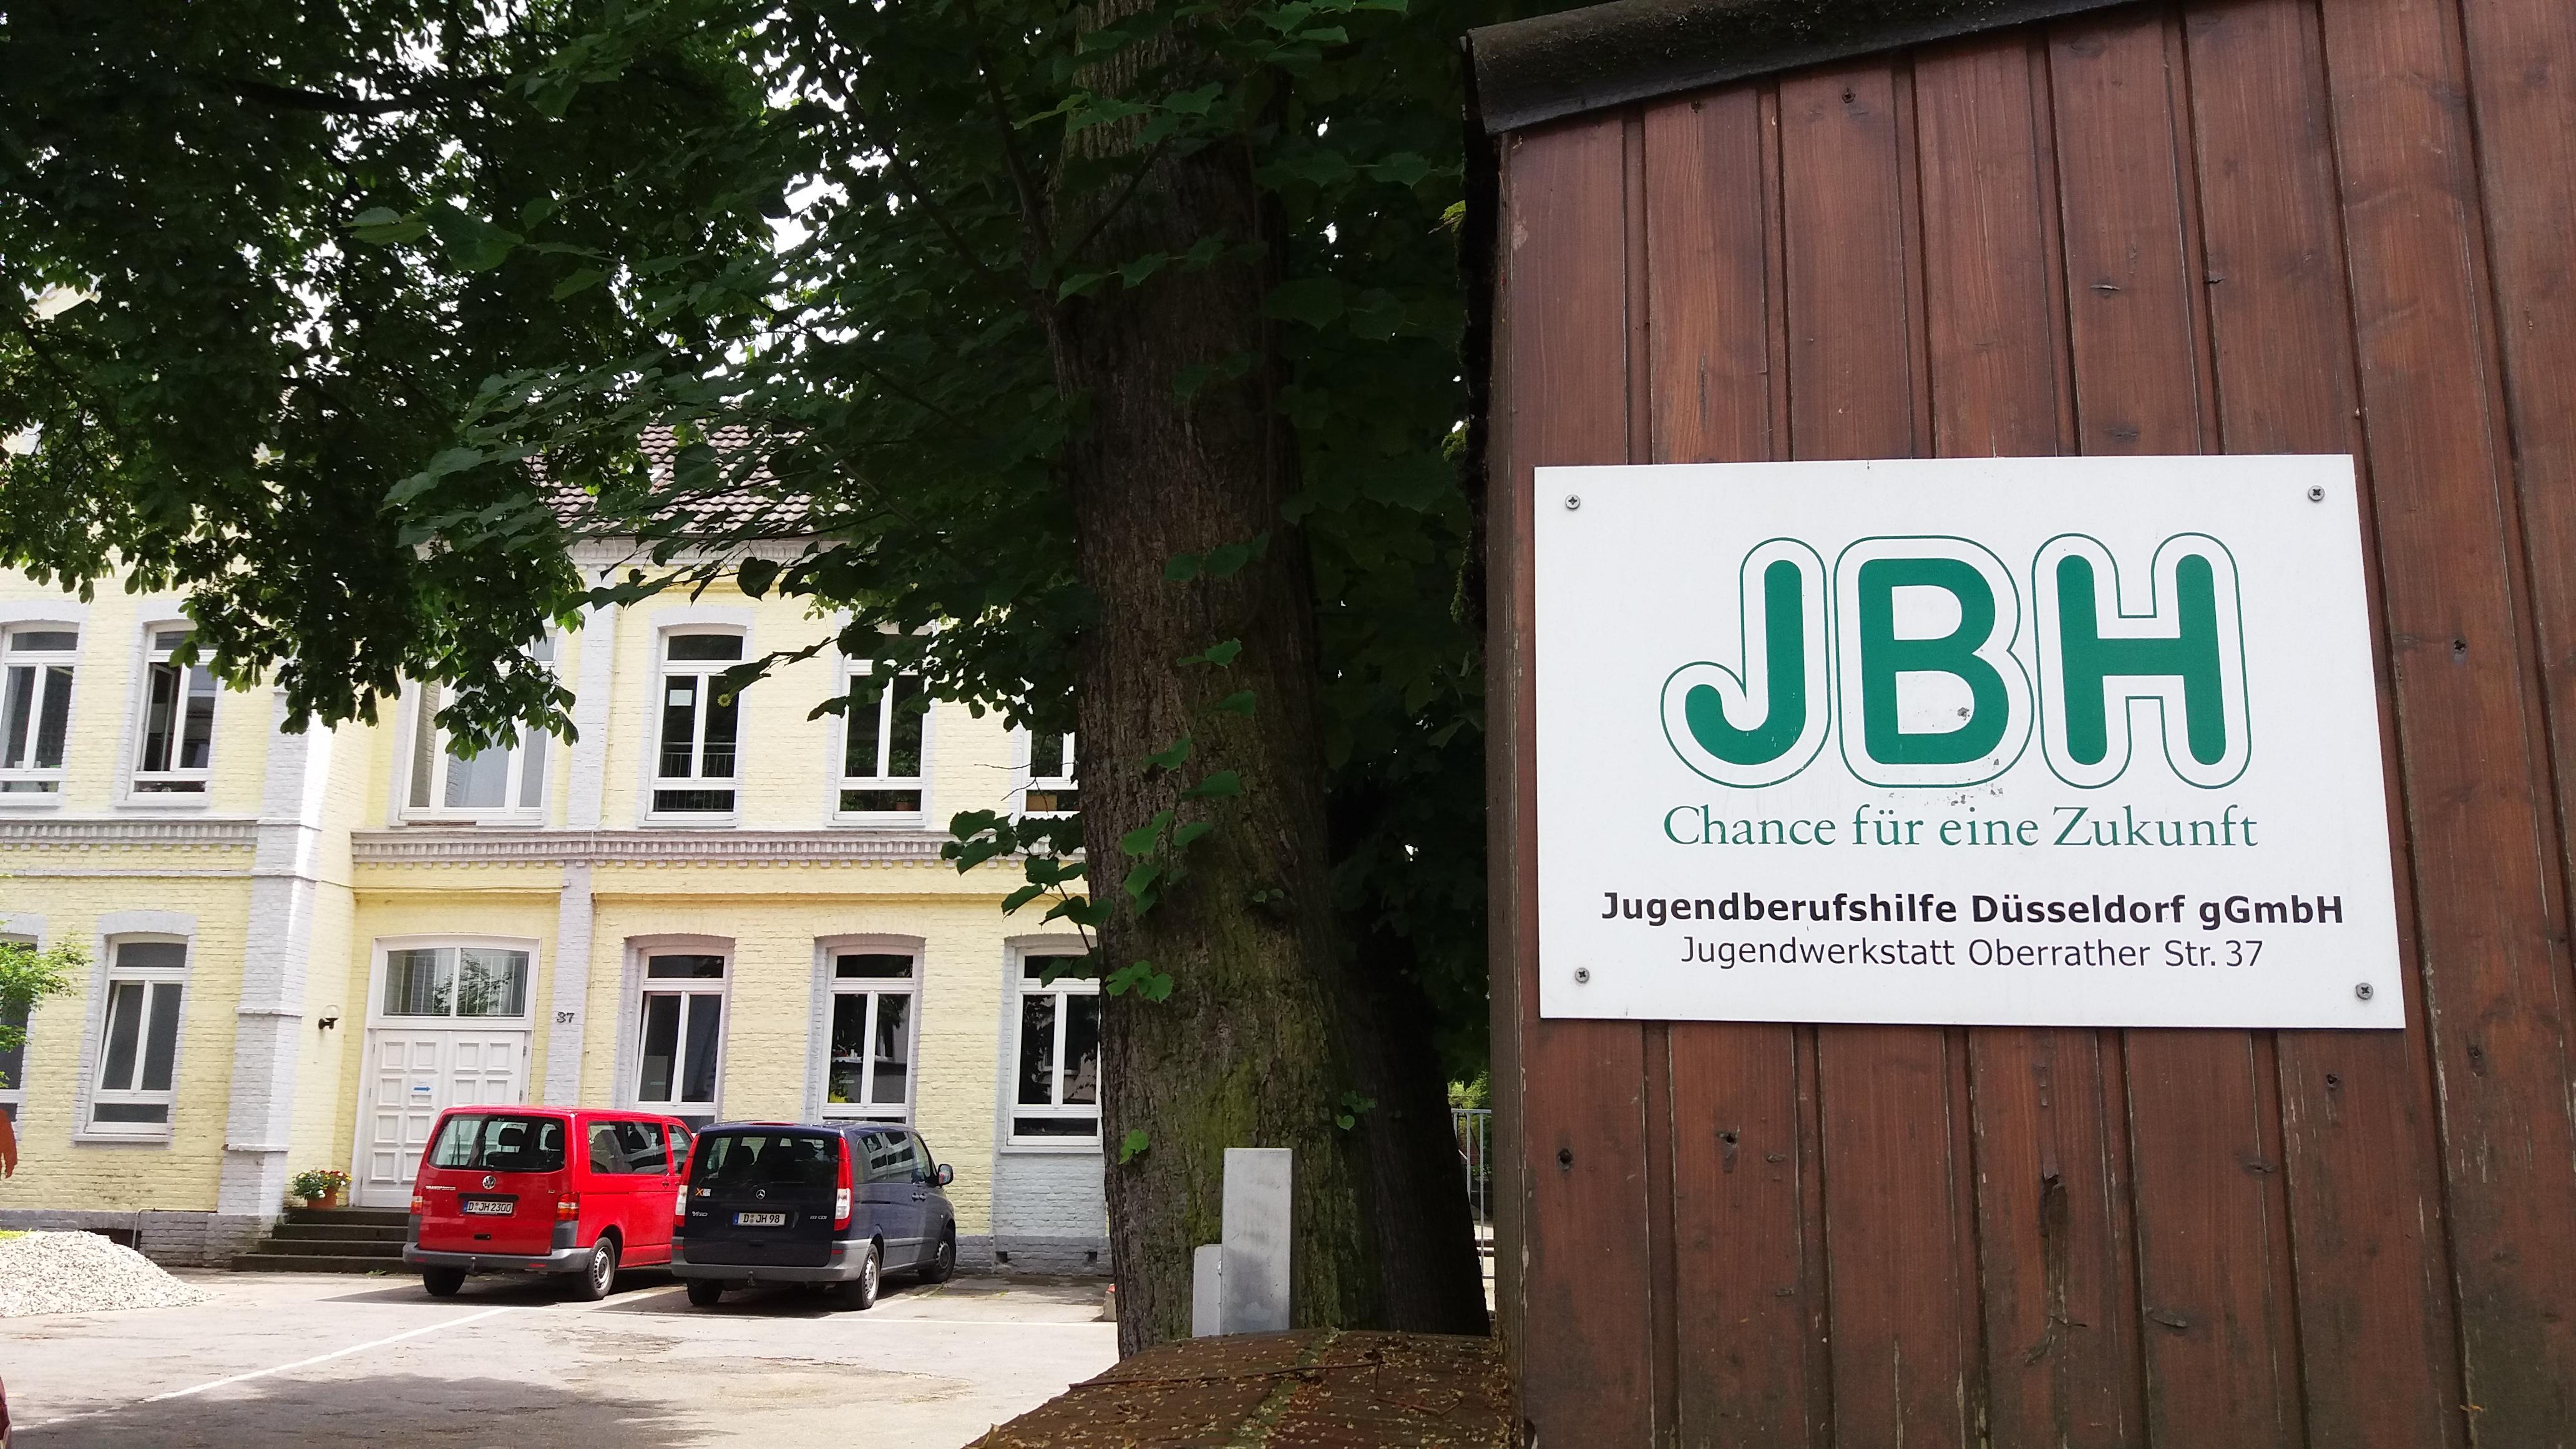 Jugendberufshilfe Oberrather Straße - 03 - 2015 - Beiträge - youpod.de